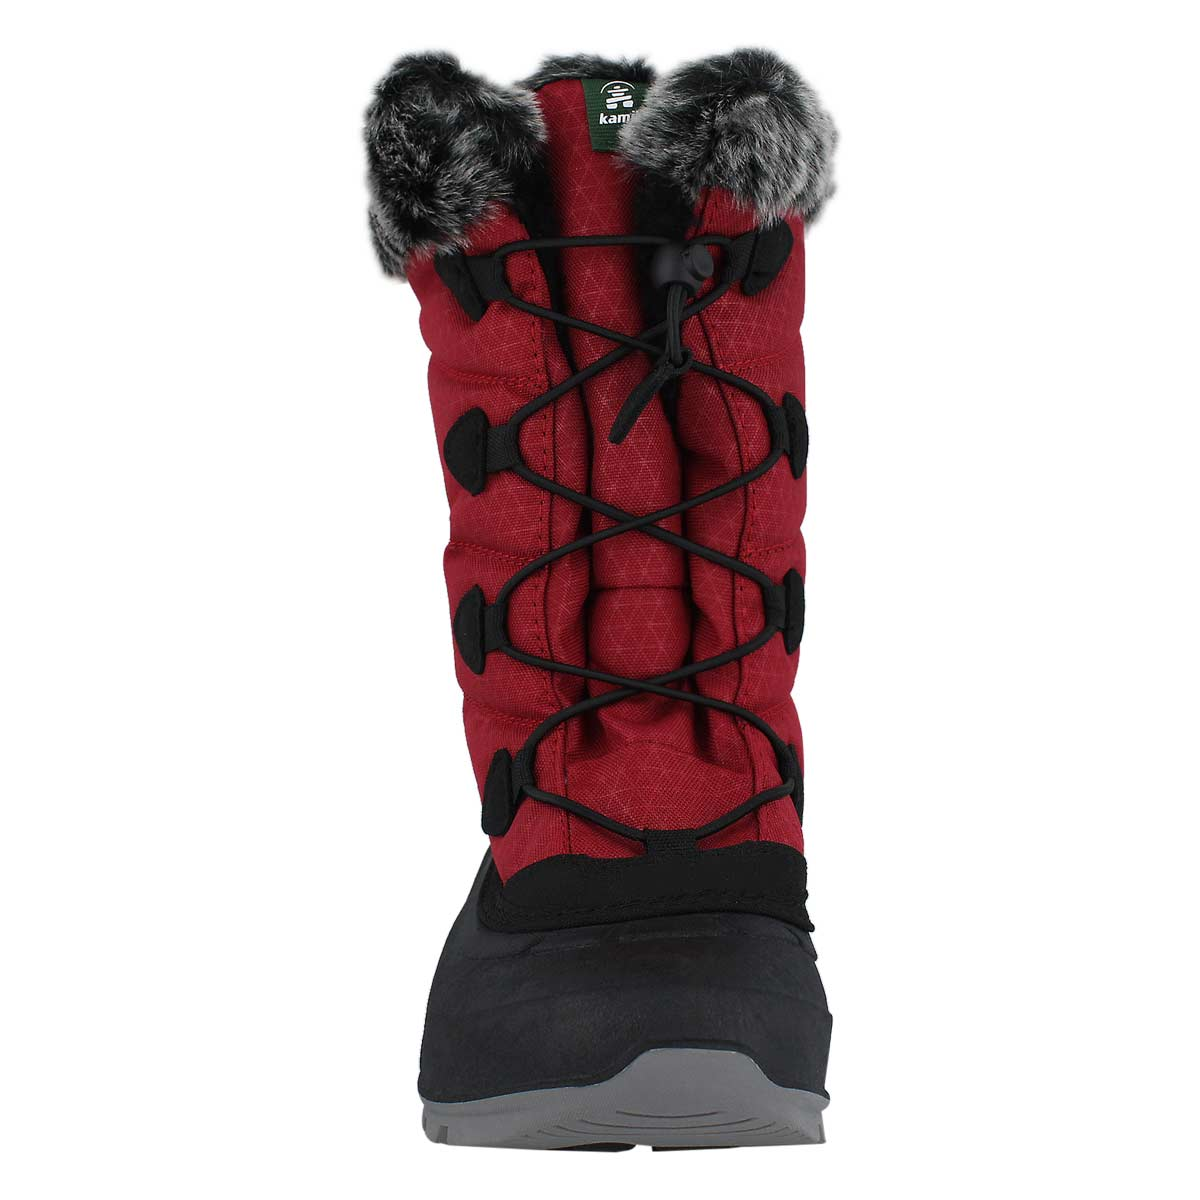 Lds Momentum 2 red wtpf winter boot